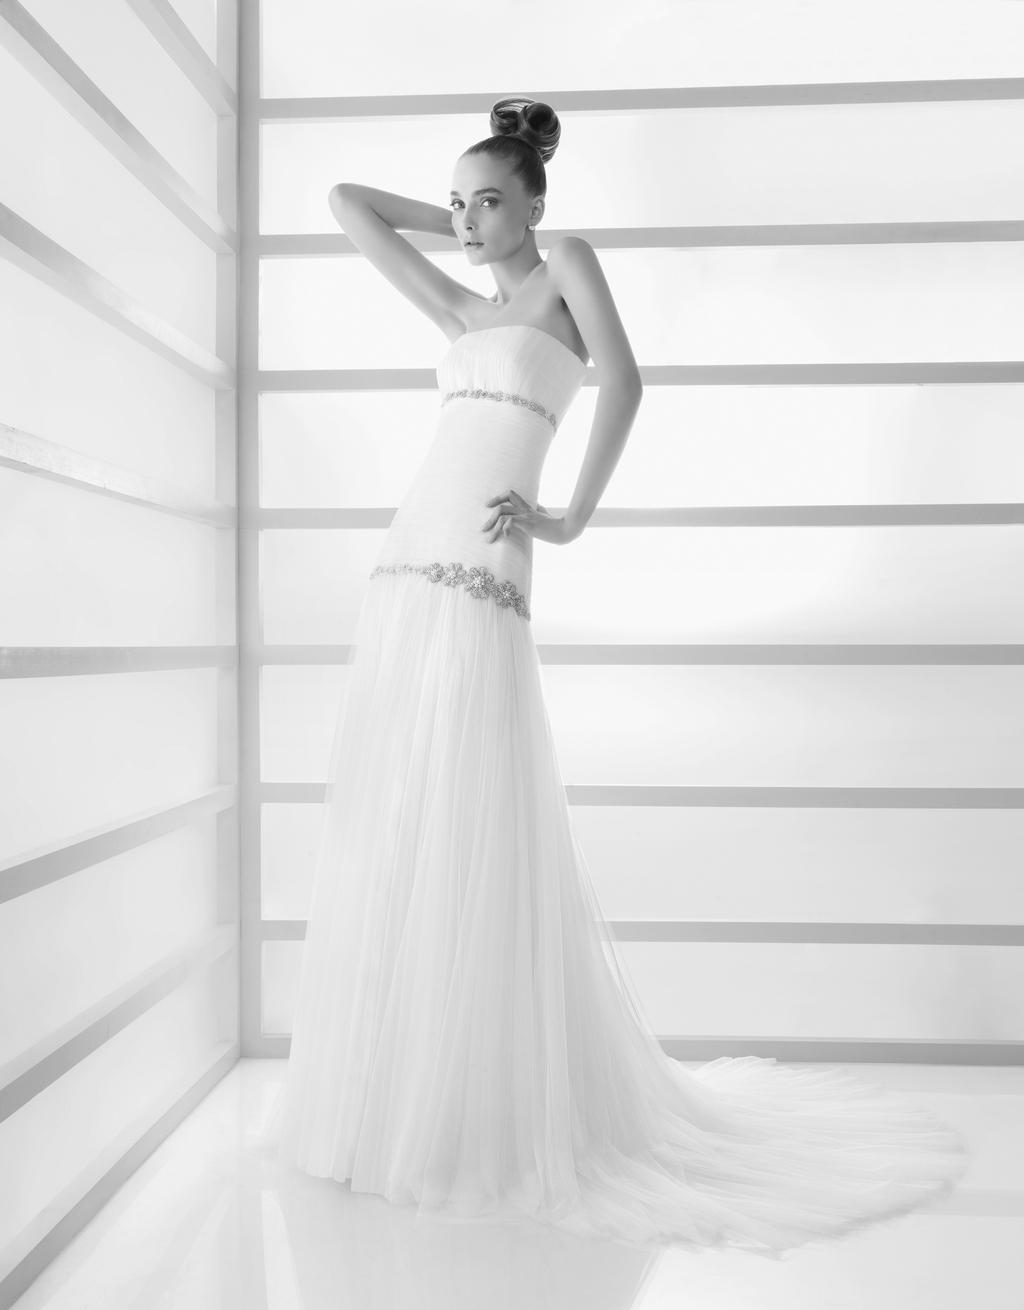 204-eco-white-strapless-drop-waist-rosa-clara-wedding-dress-front.full